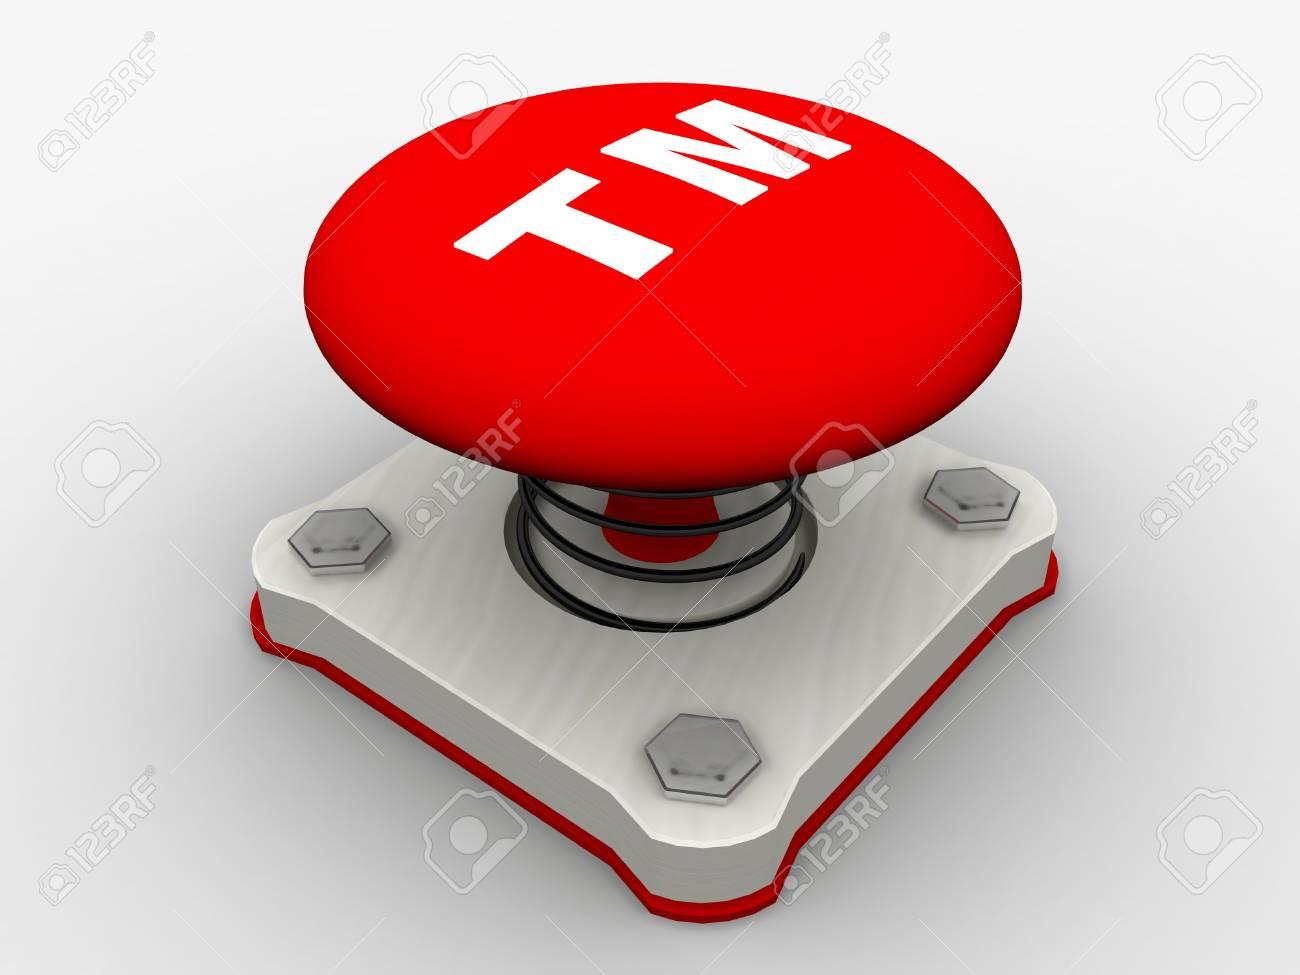 Red start button on a metal platform Stock Photo - 5037386